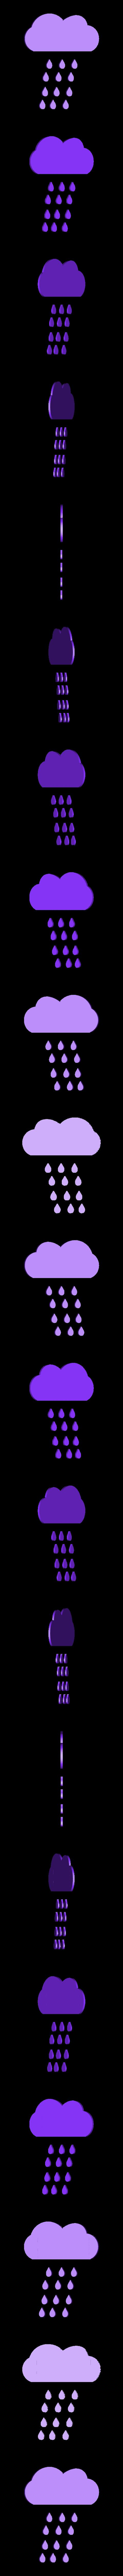 nuage et pluie.stl Download STL file rain fall • 3D printable template, catf3d